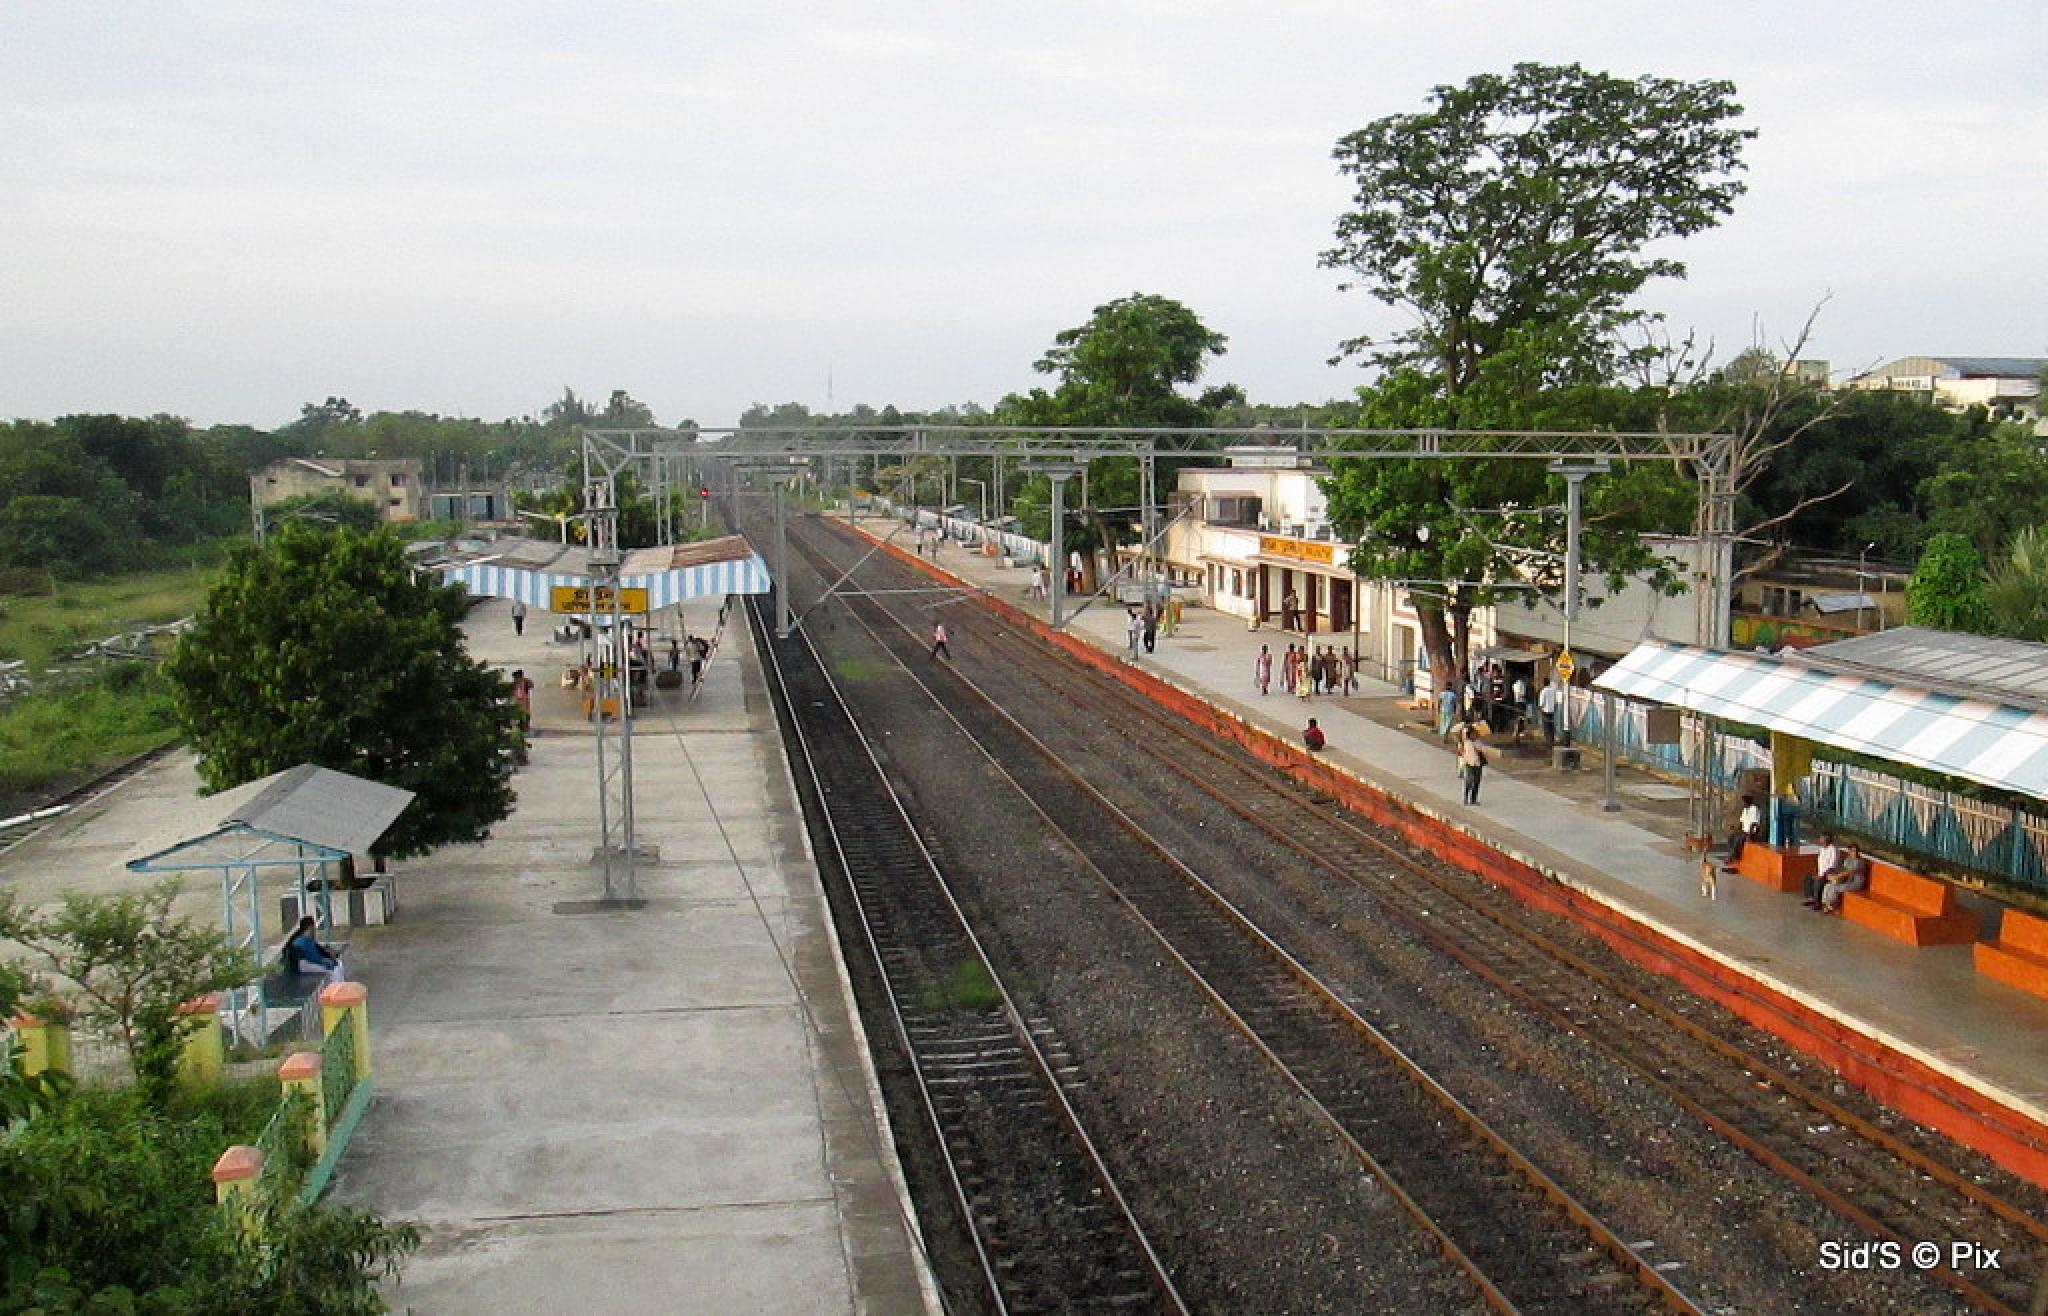 Station by Siddharth Sanyal